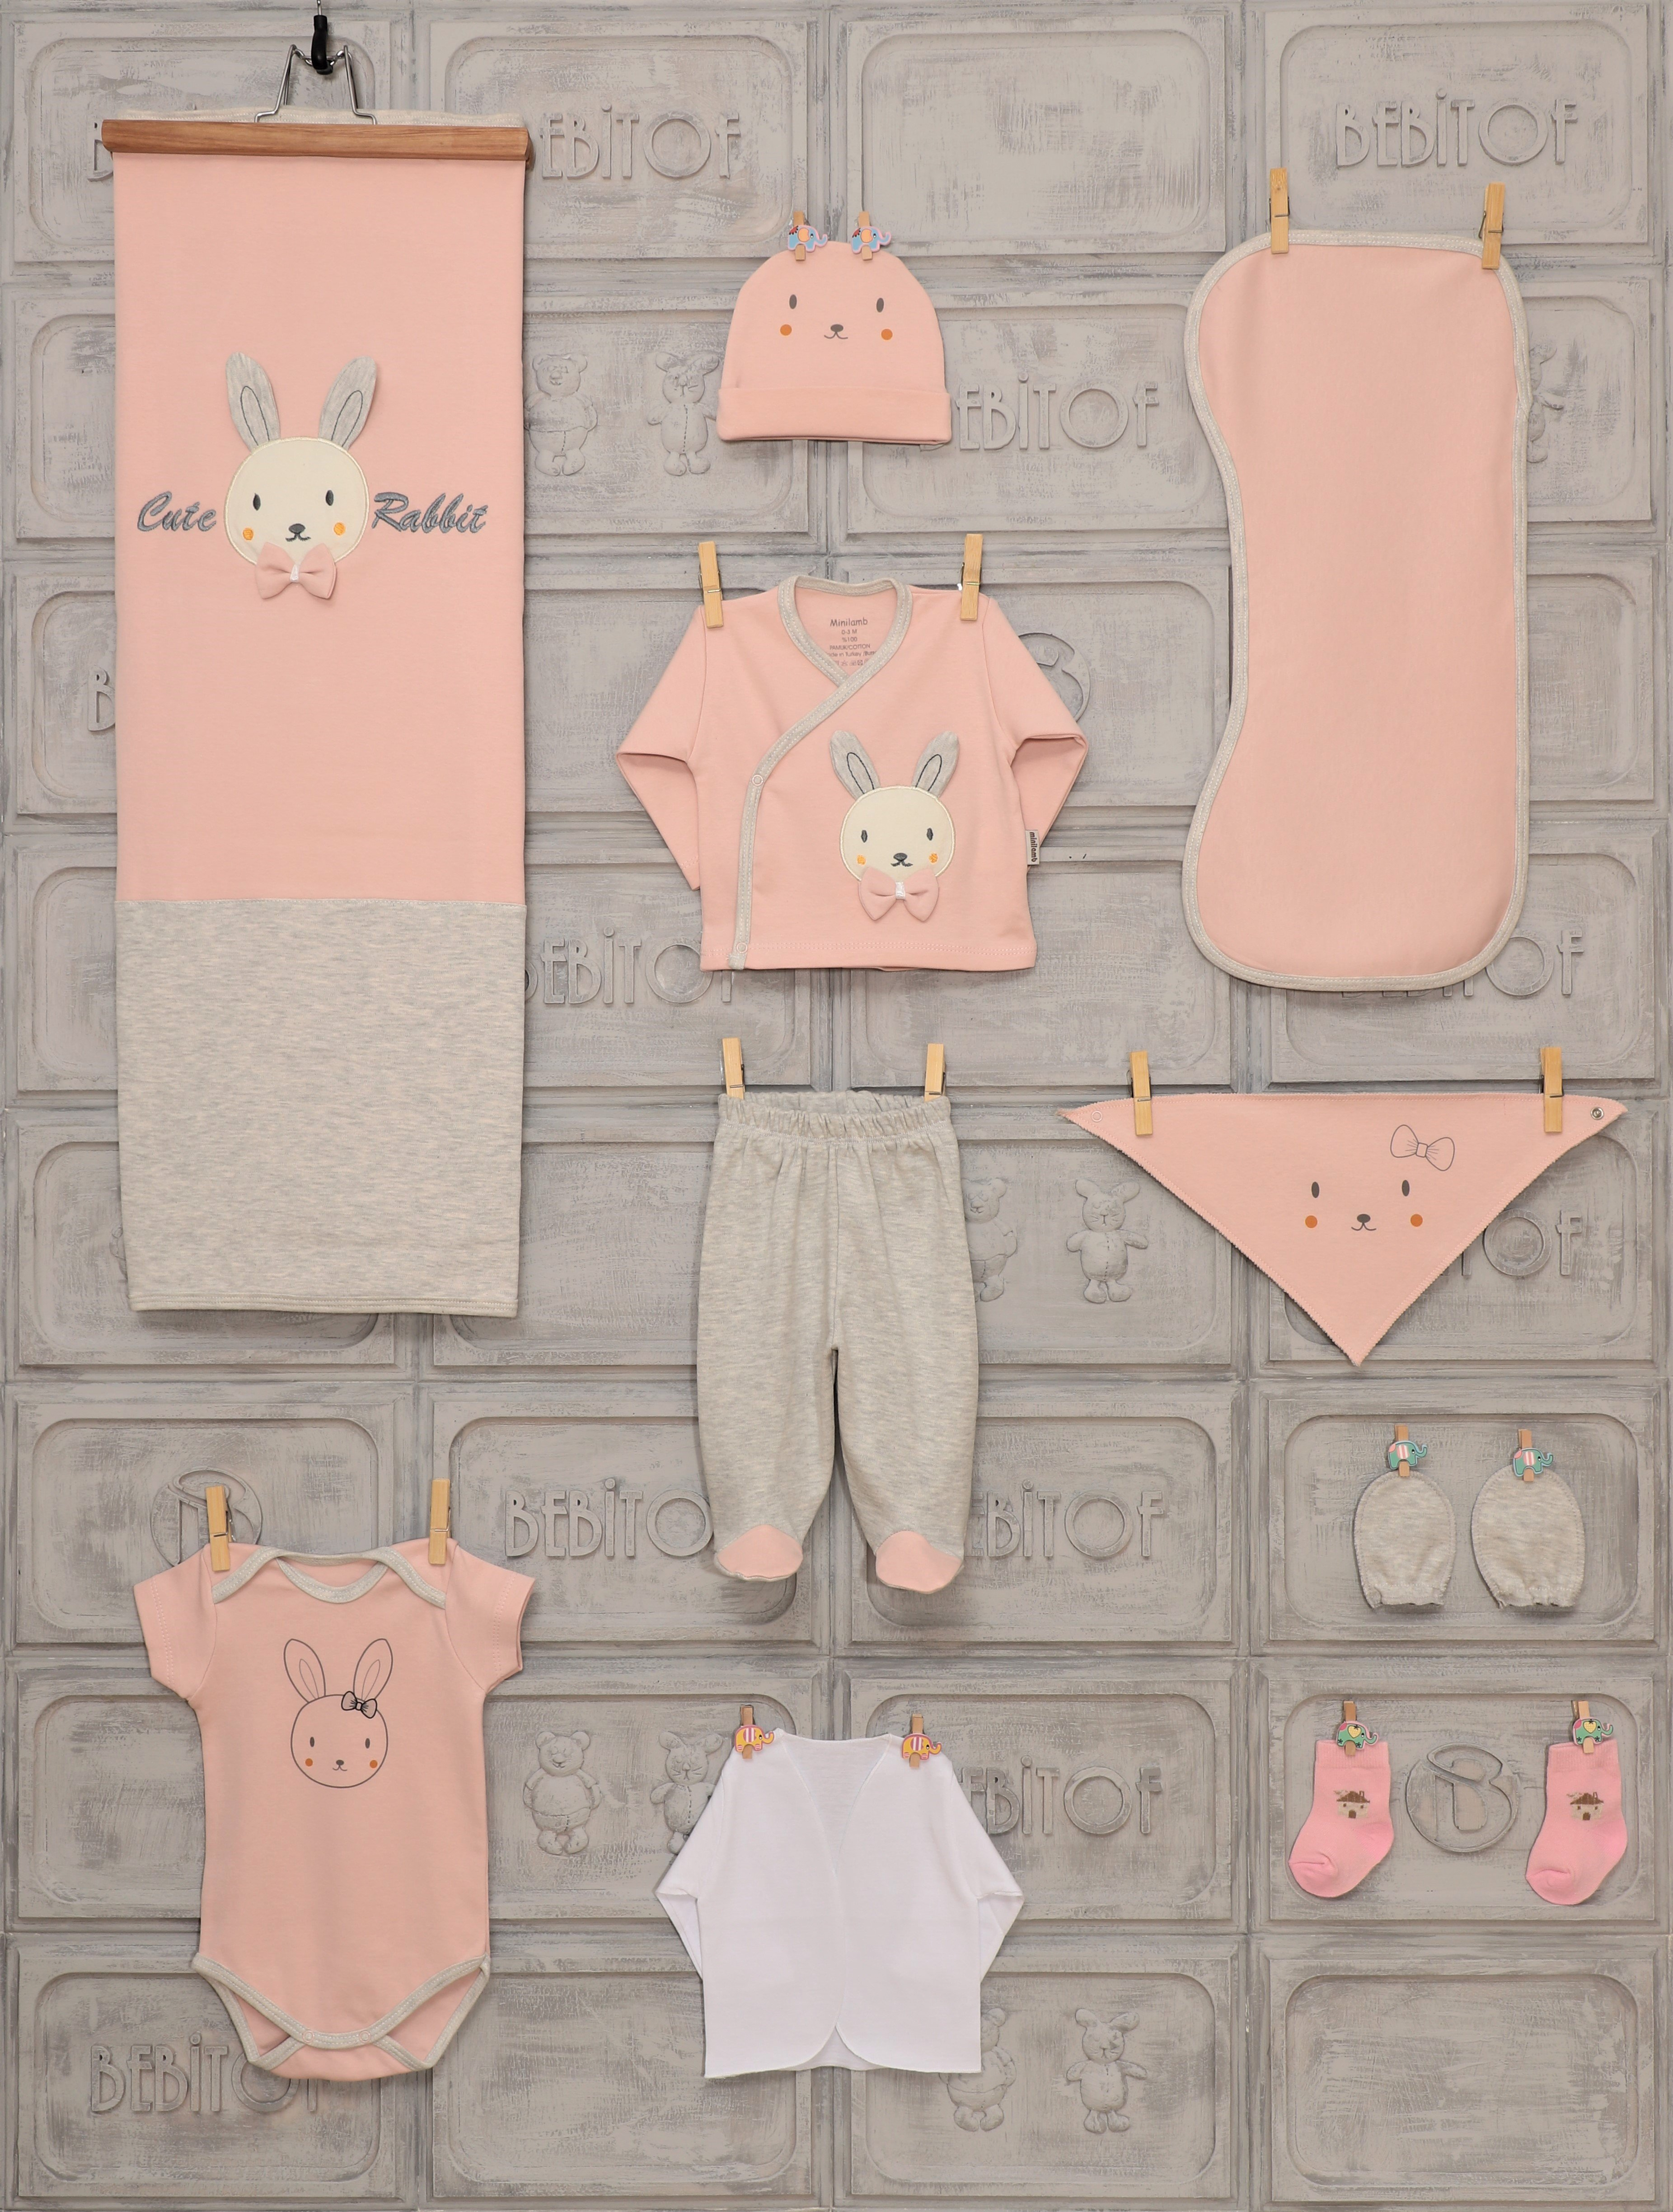 100% Turksh Cotton 10 Pcs, Girl Boy Newborn Baby Clothing Set Unısex, Lux, Premium,Underwear, Apron, Socks, Glove,Hat,Trousers